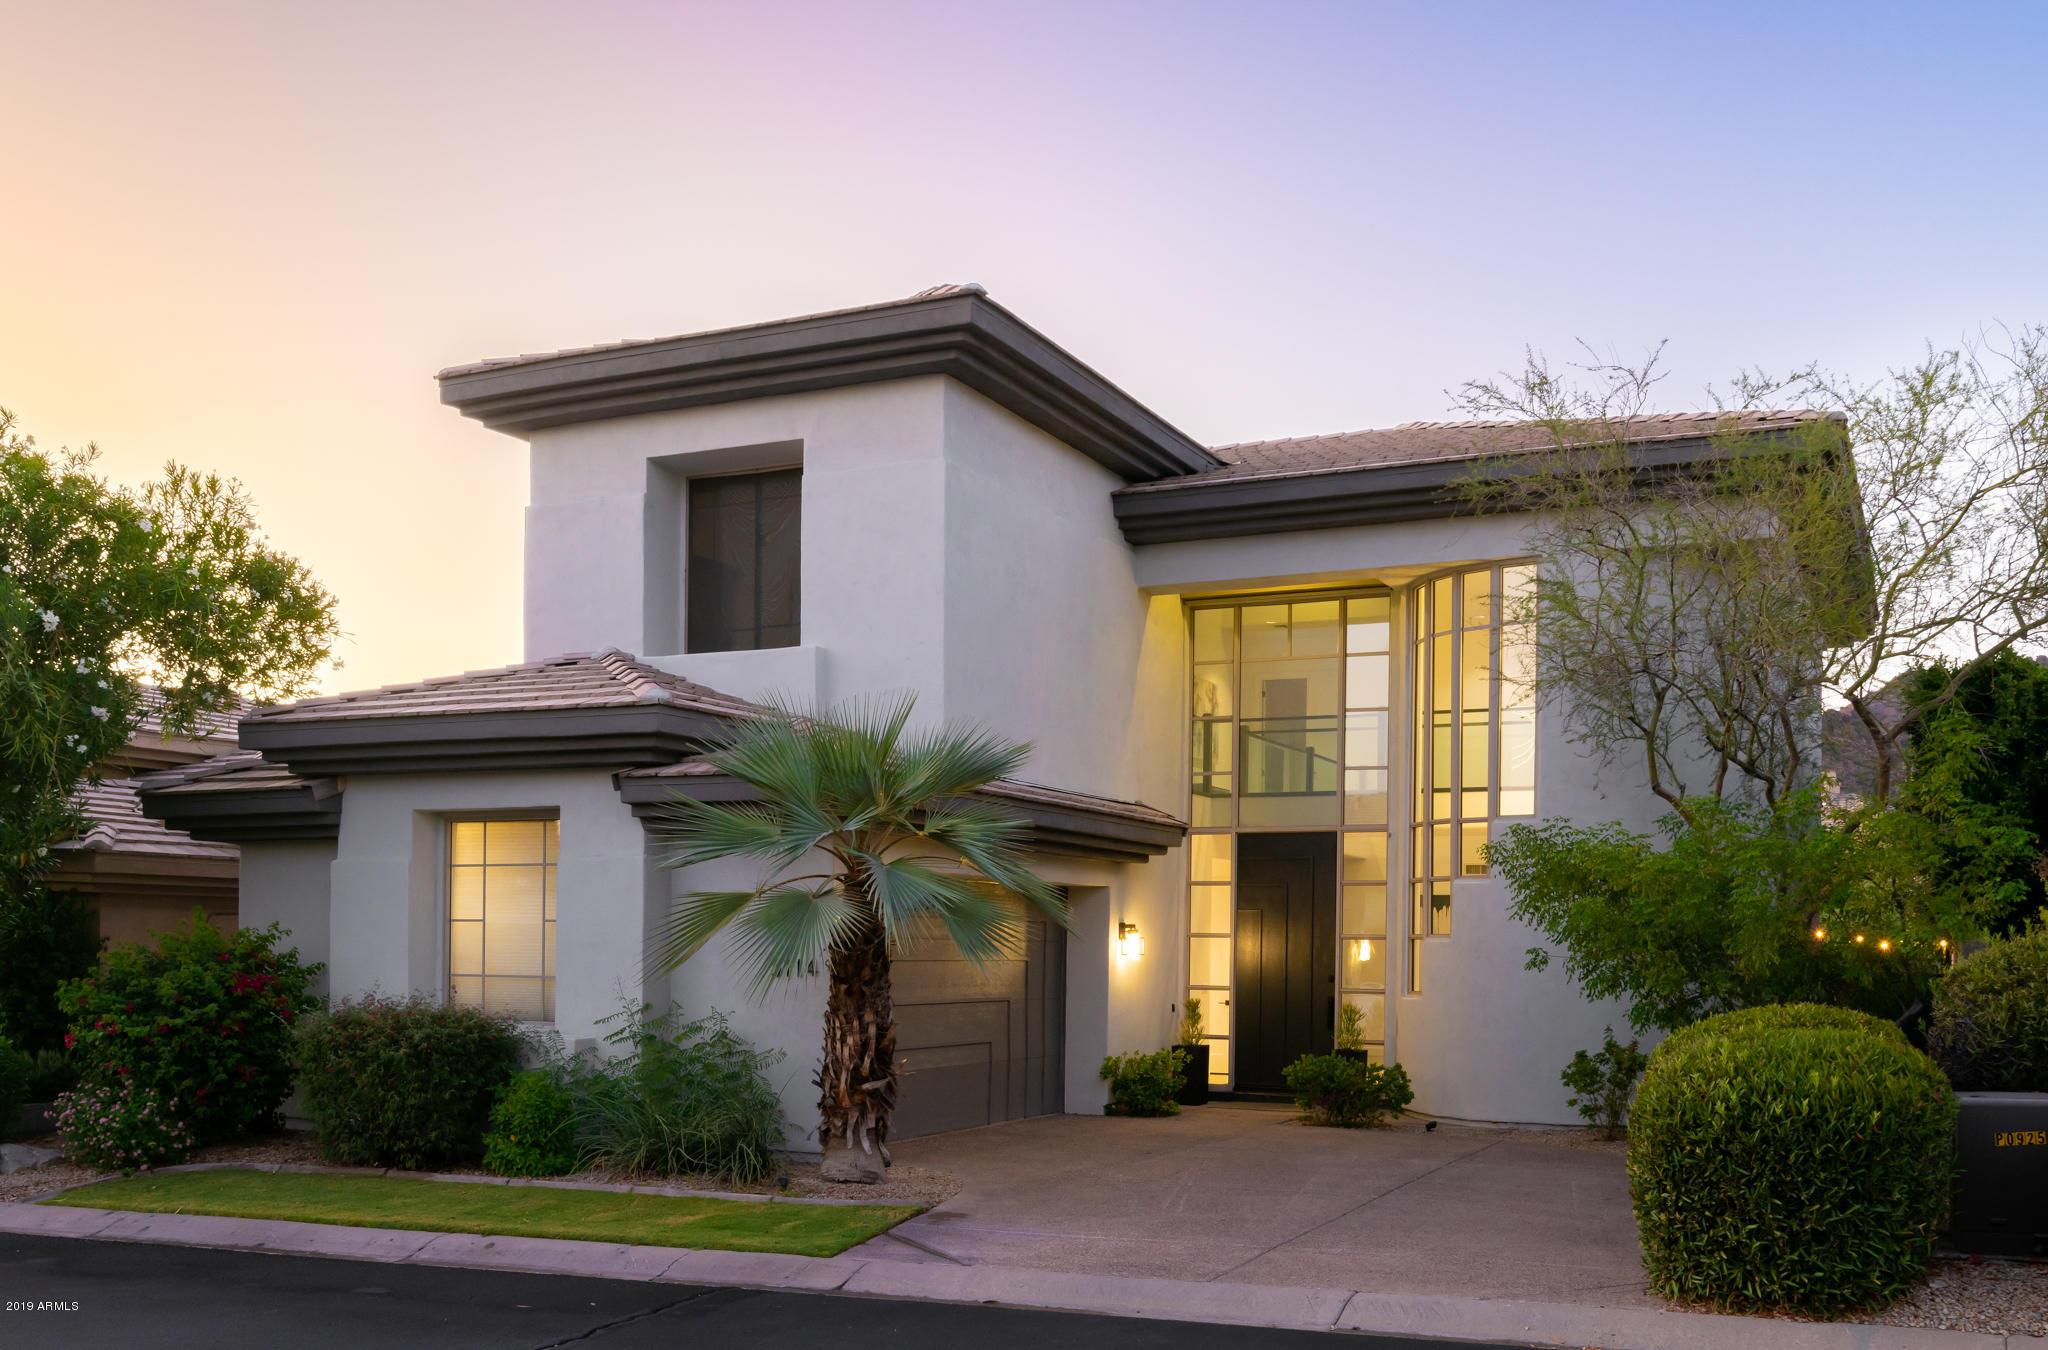 Photo of 3114 E SQUAW PEAK Circle, Phoenix, AZ 85016